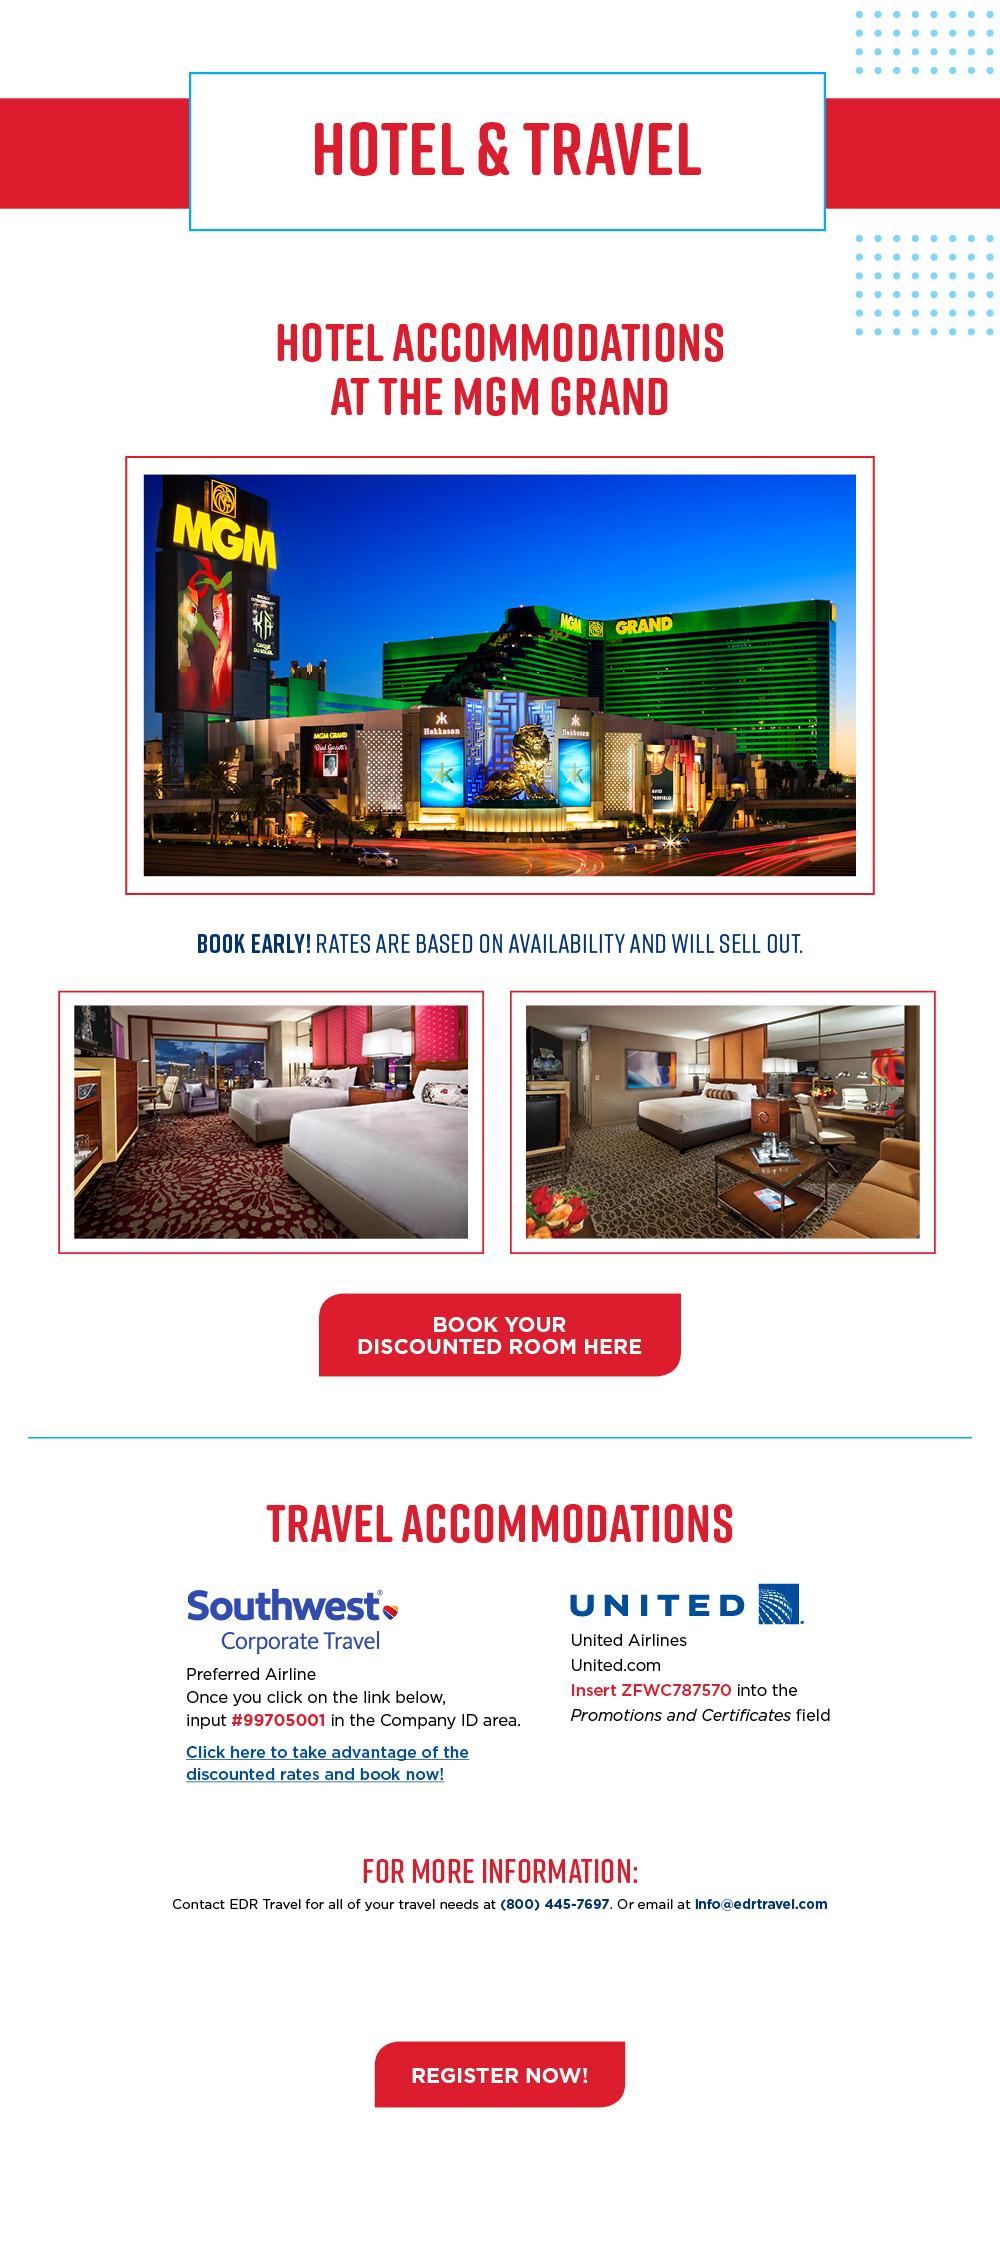 HOTEL_REGISTRATION